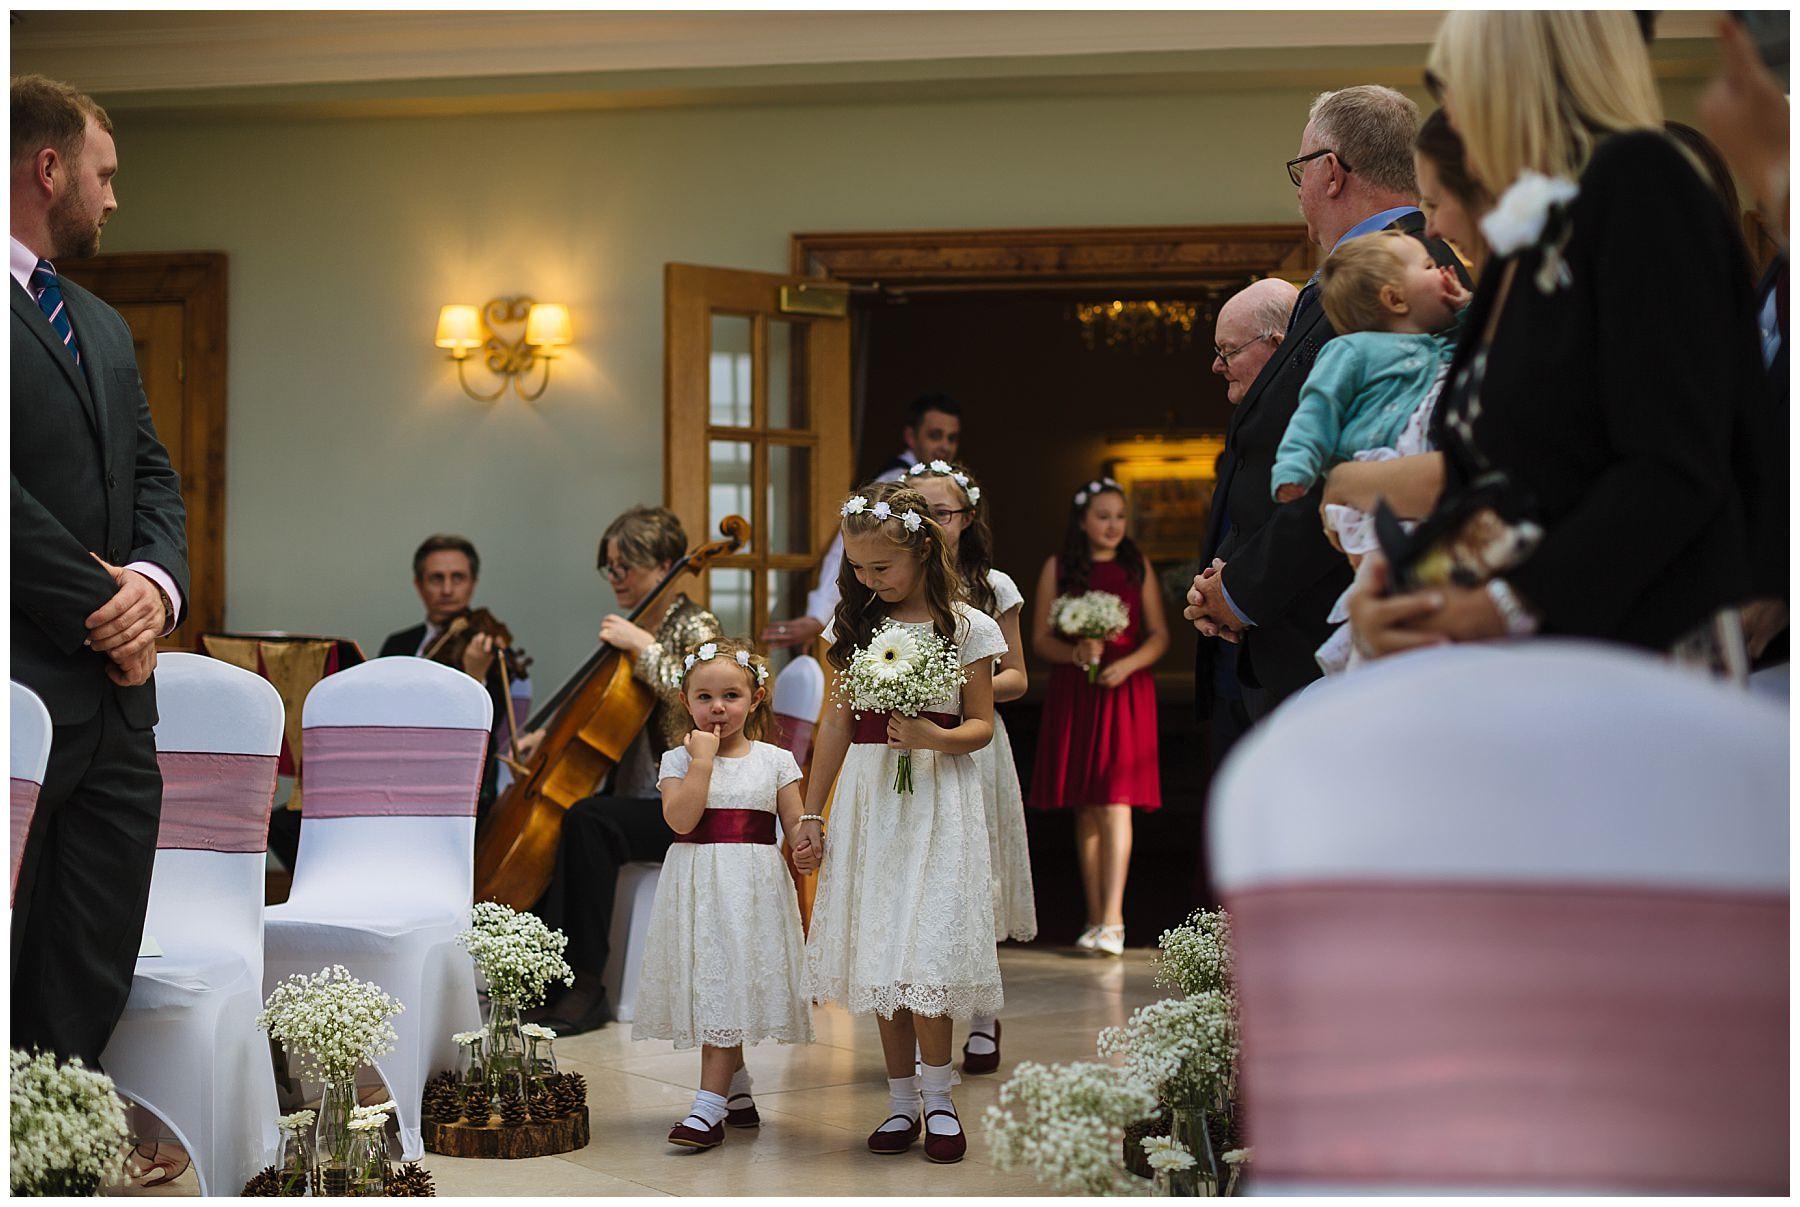 flowergirls arrive for wedding ceremony